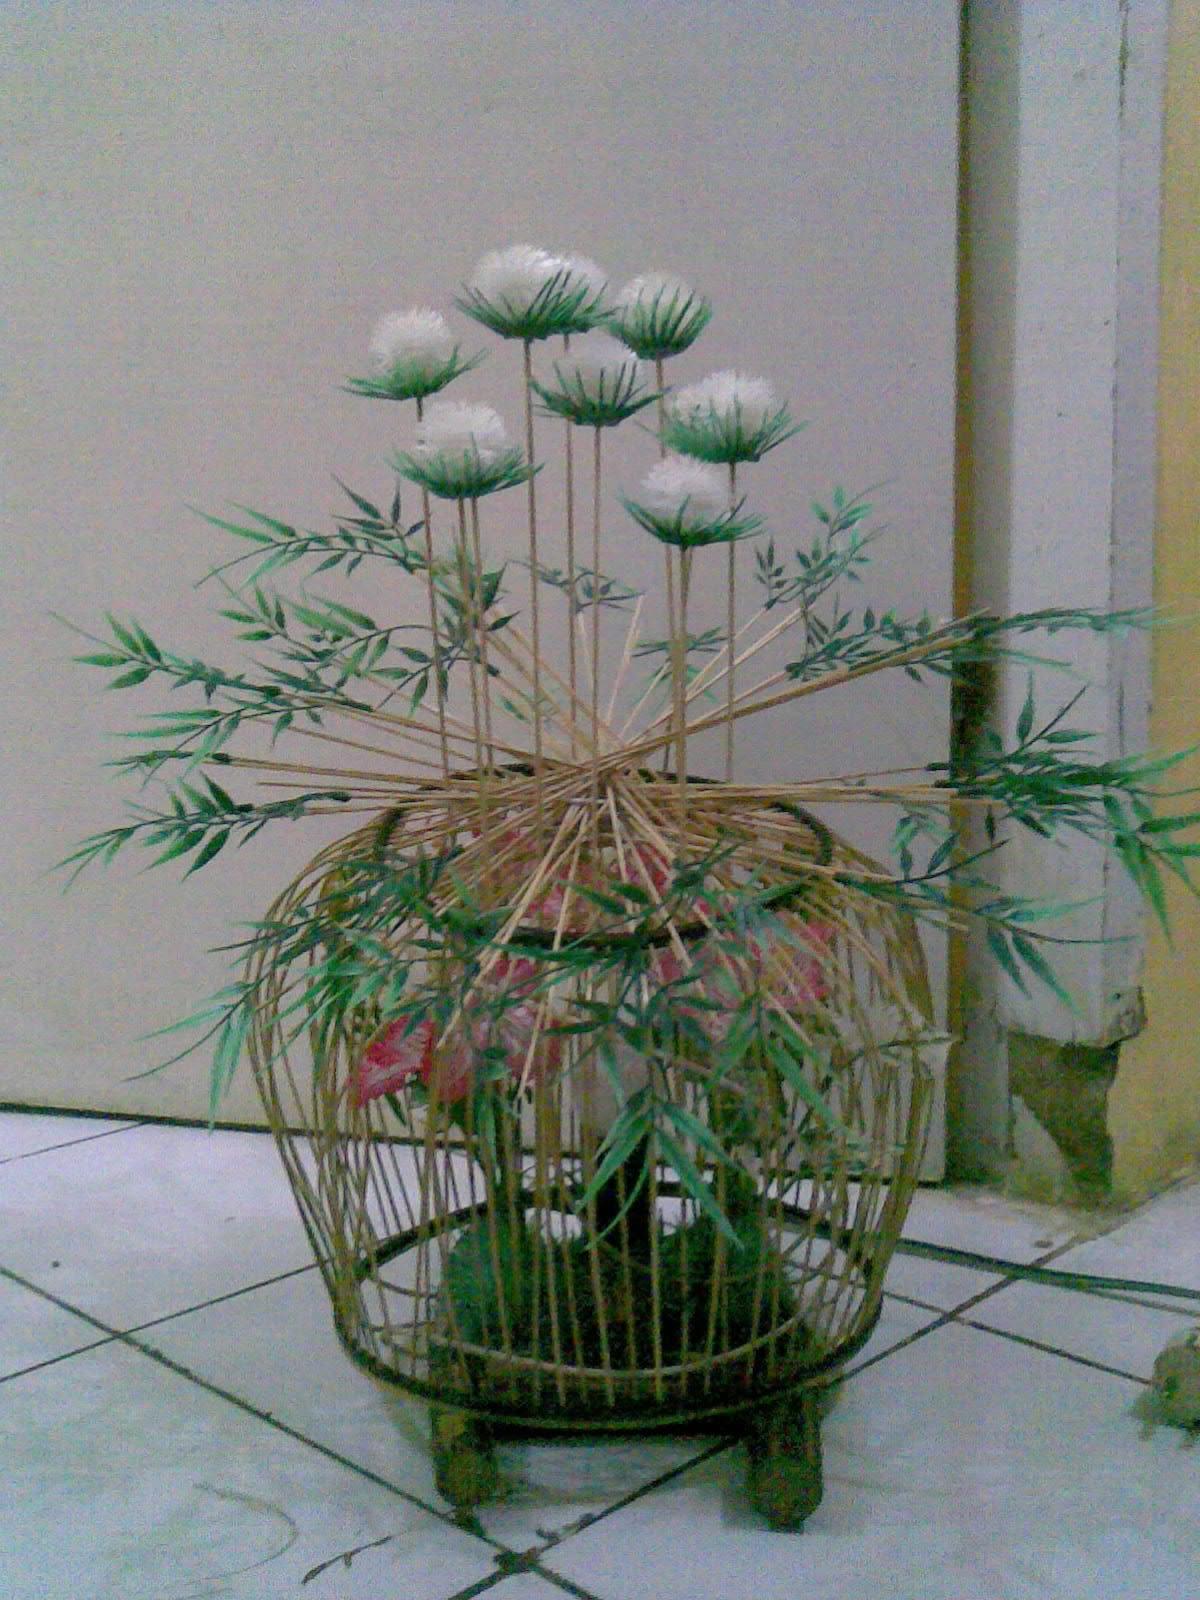 Lampion Vas bunga Rotan   Kerajinan Rotan,Kayu dan Bambu